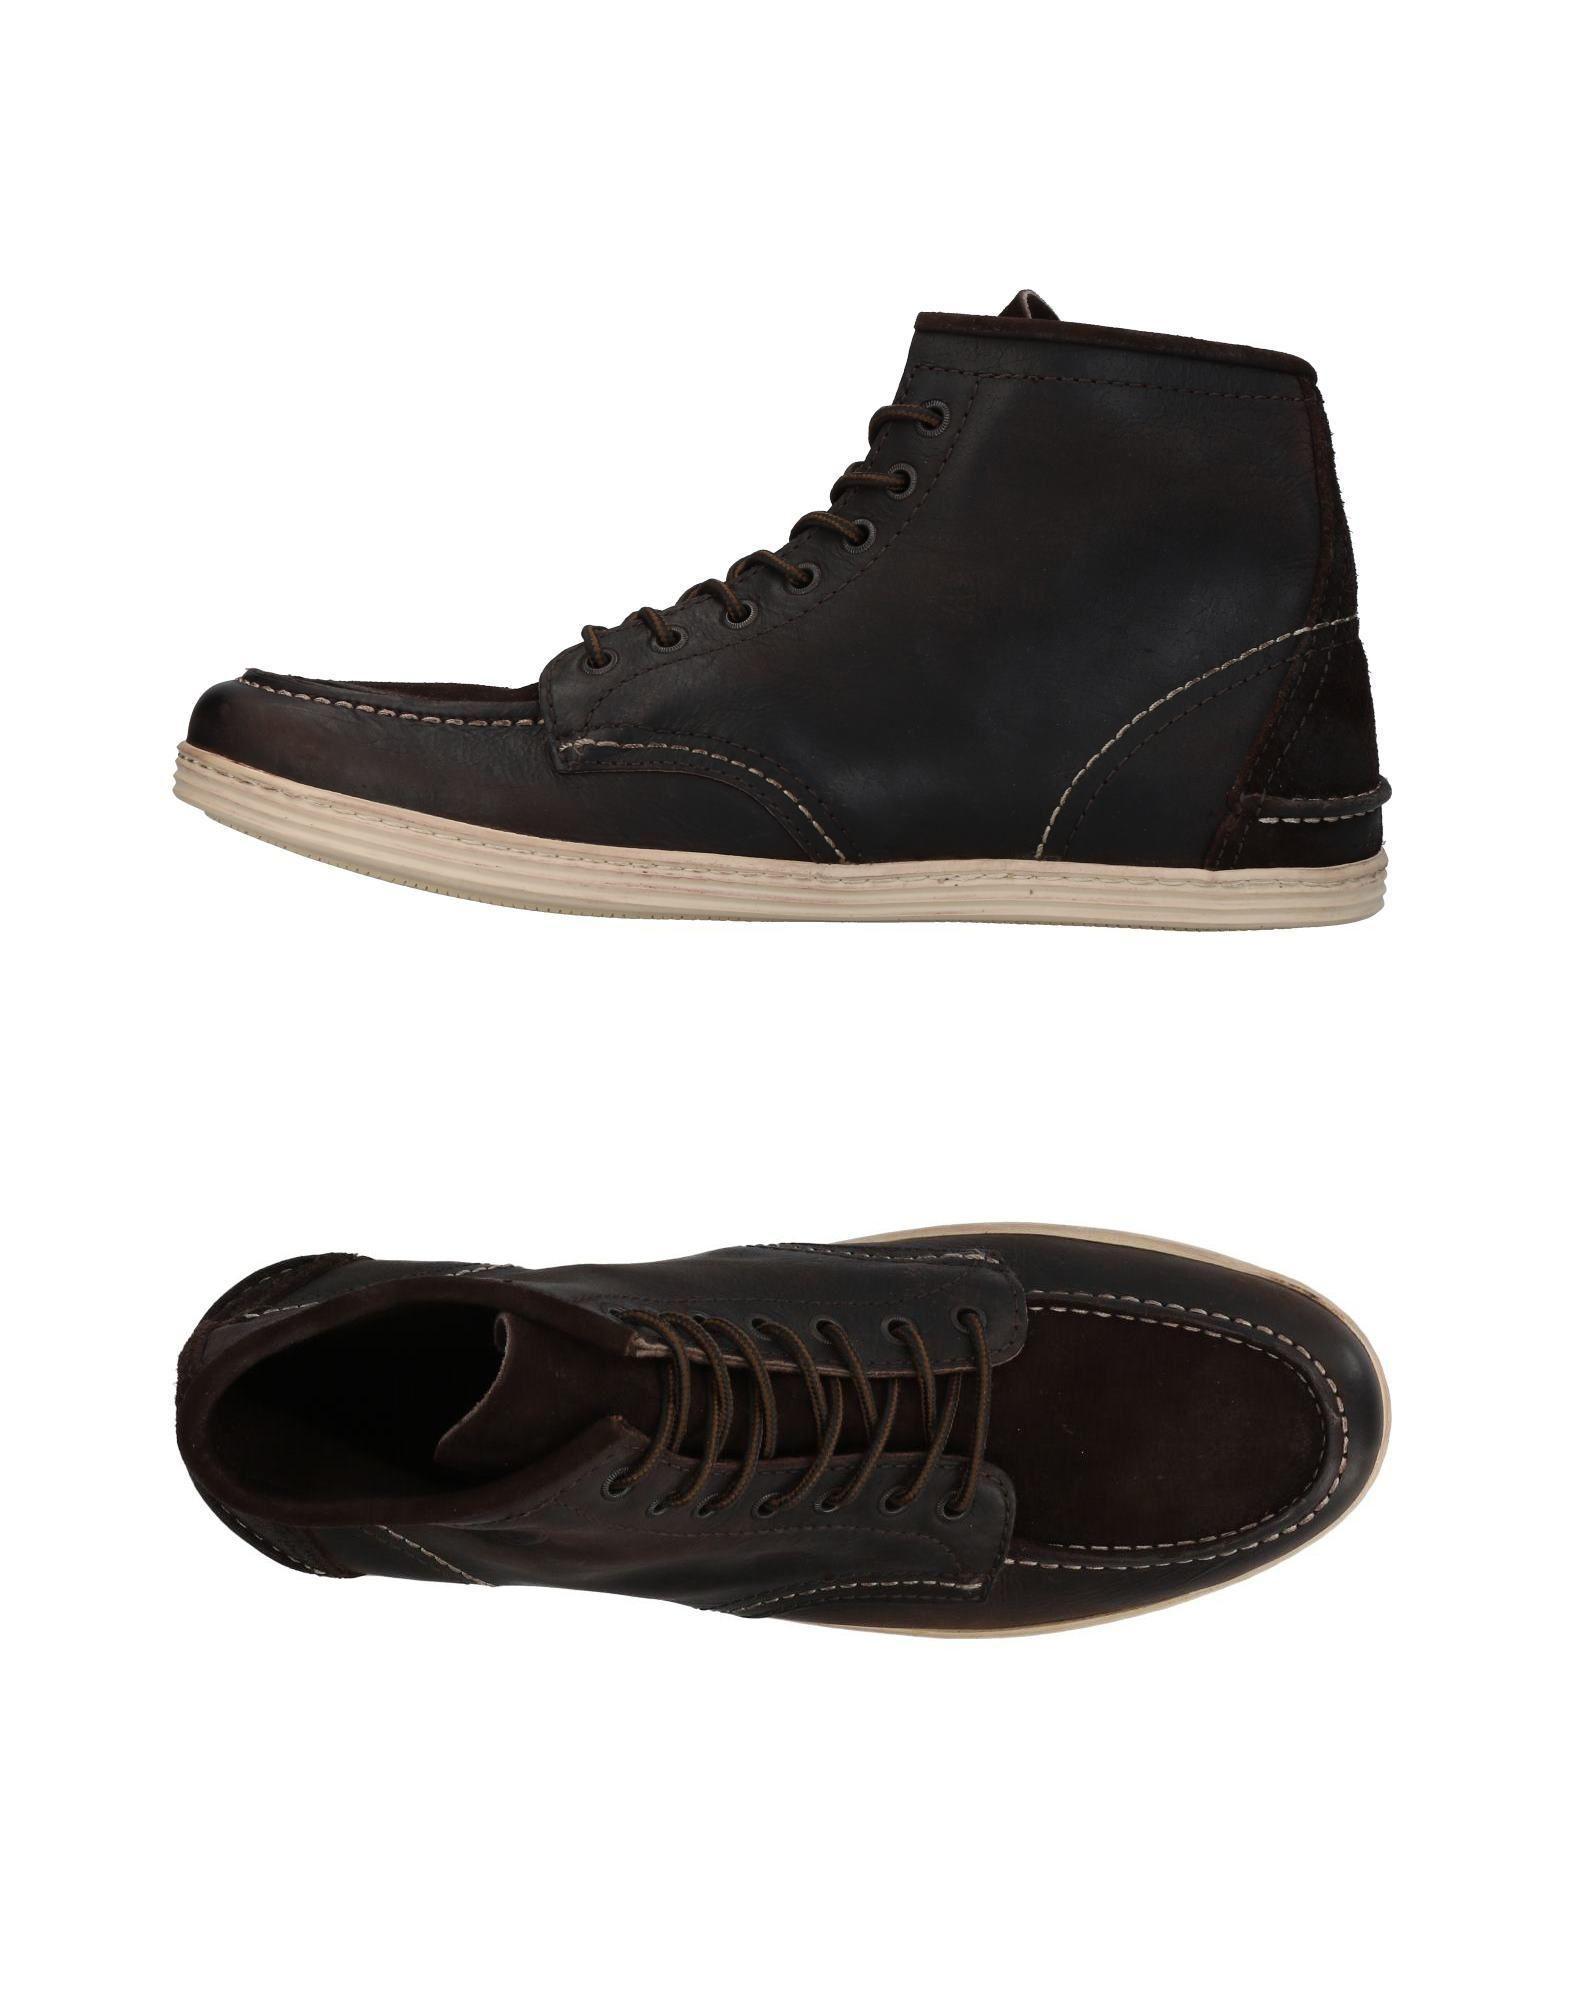 FOOTWEAR - High-tops & sneakers Preventi z6GmtIt